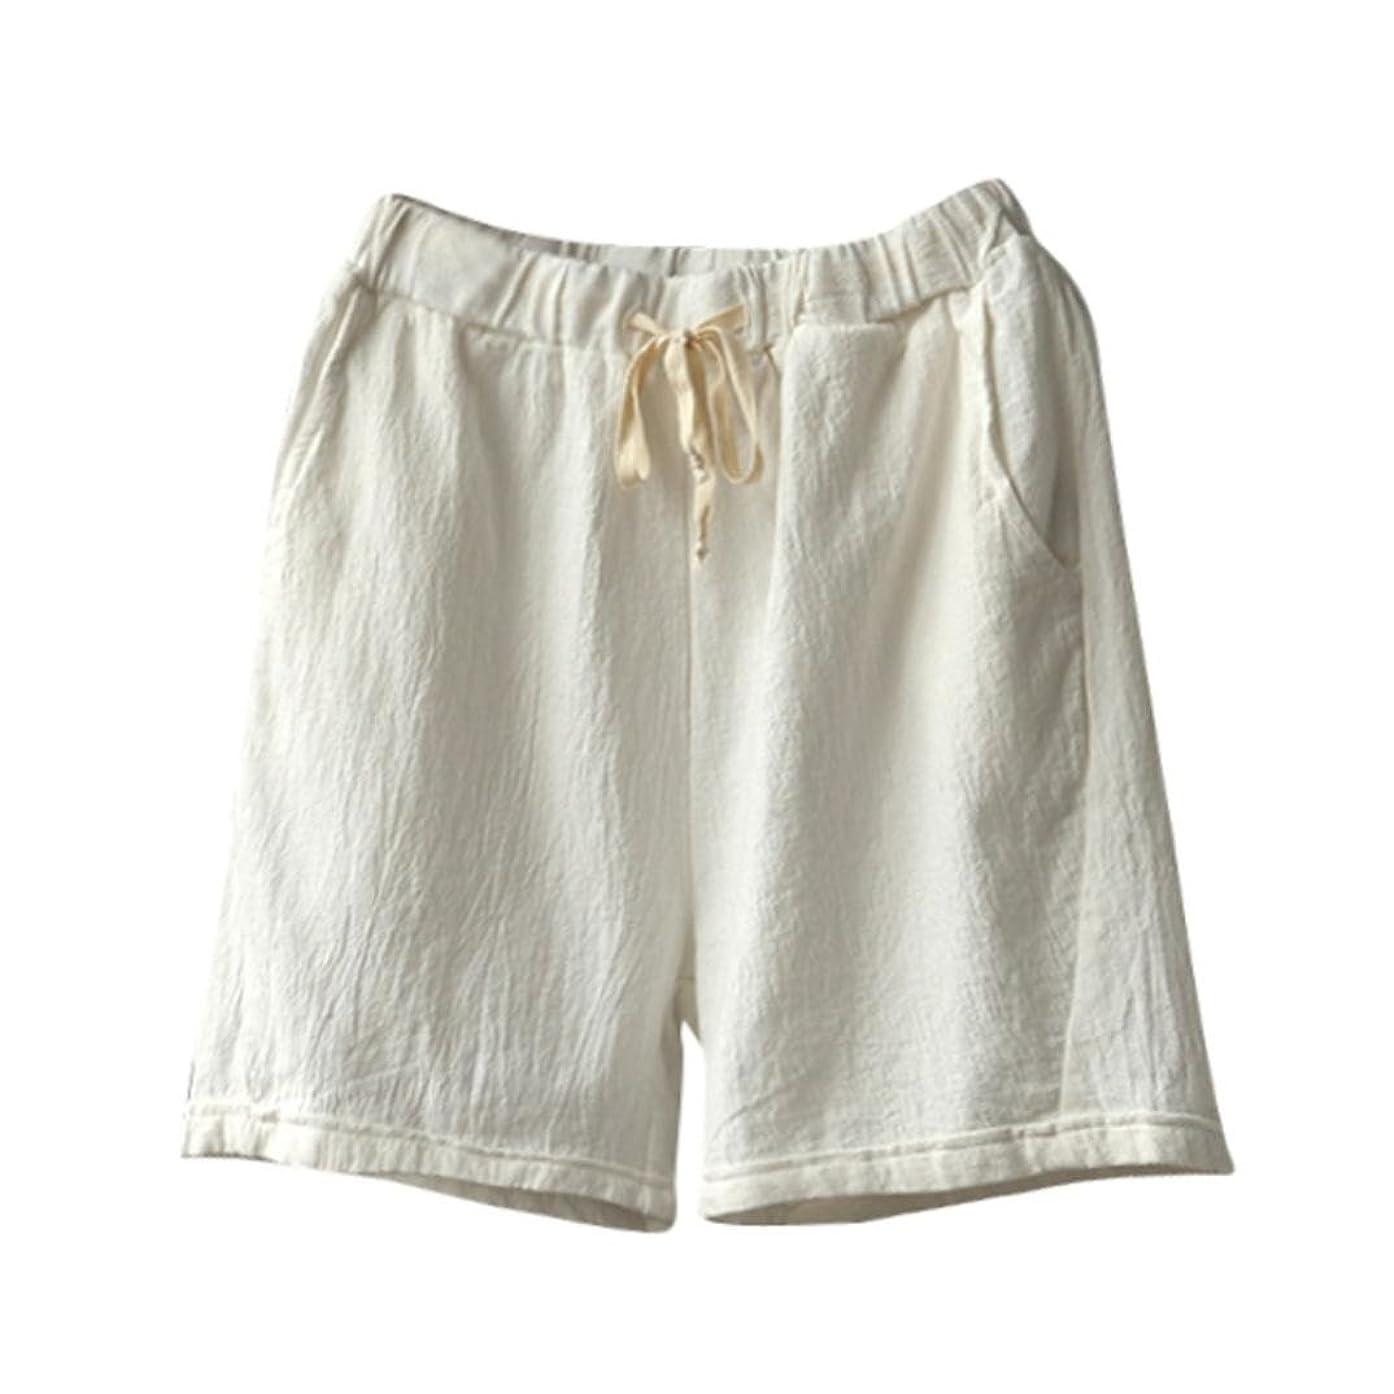 Women Cotton Linen Summer Short Pants Elastic Waist Pocket Casual Shorts Jersey Lounge Walking Shorts